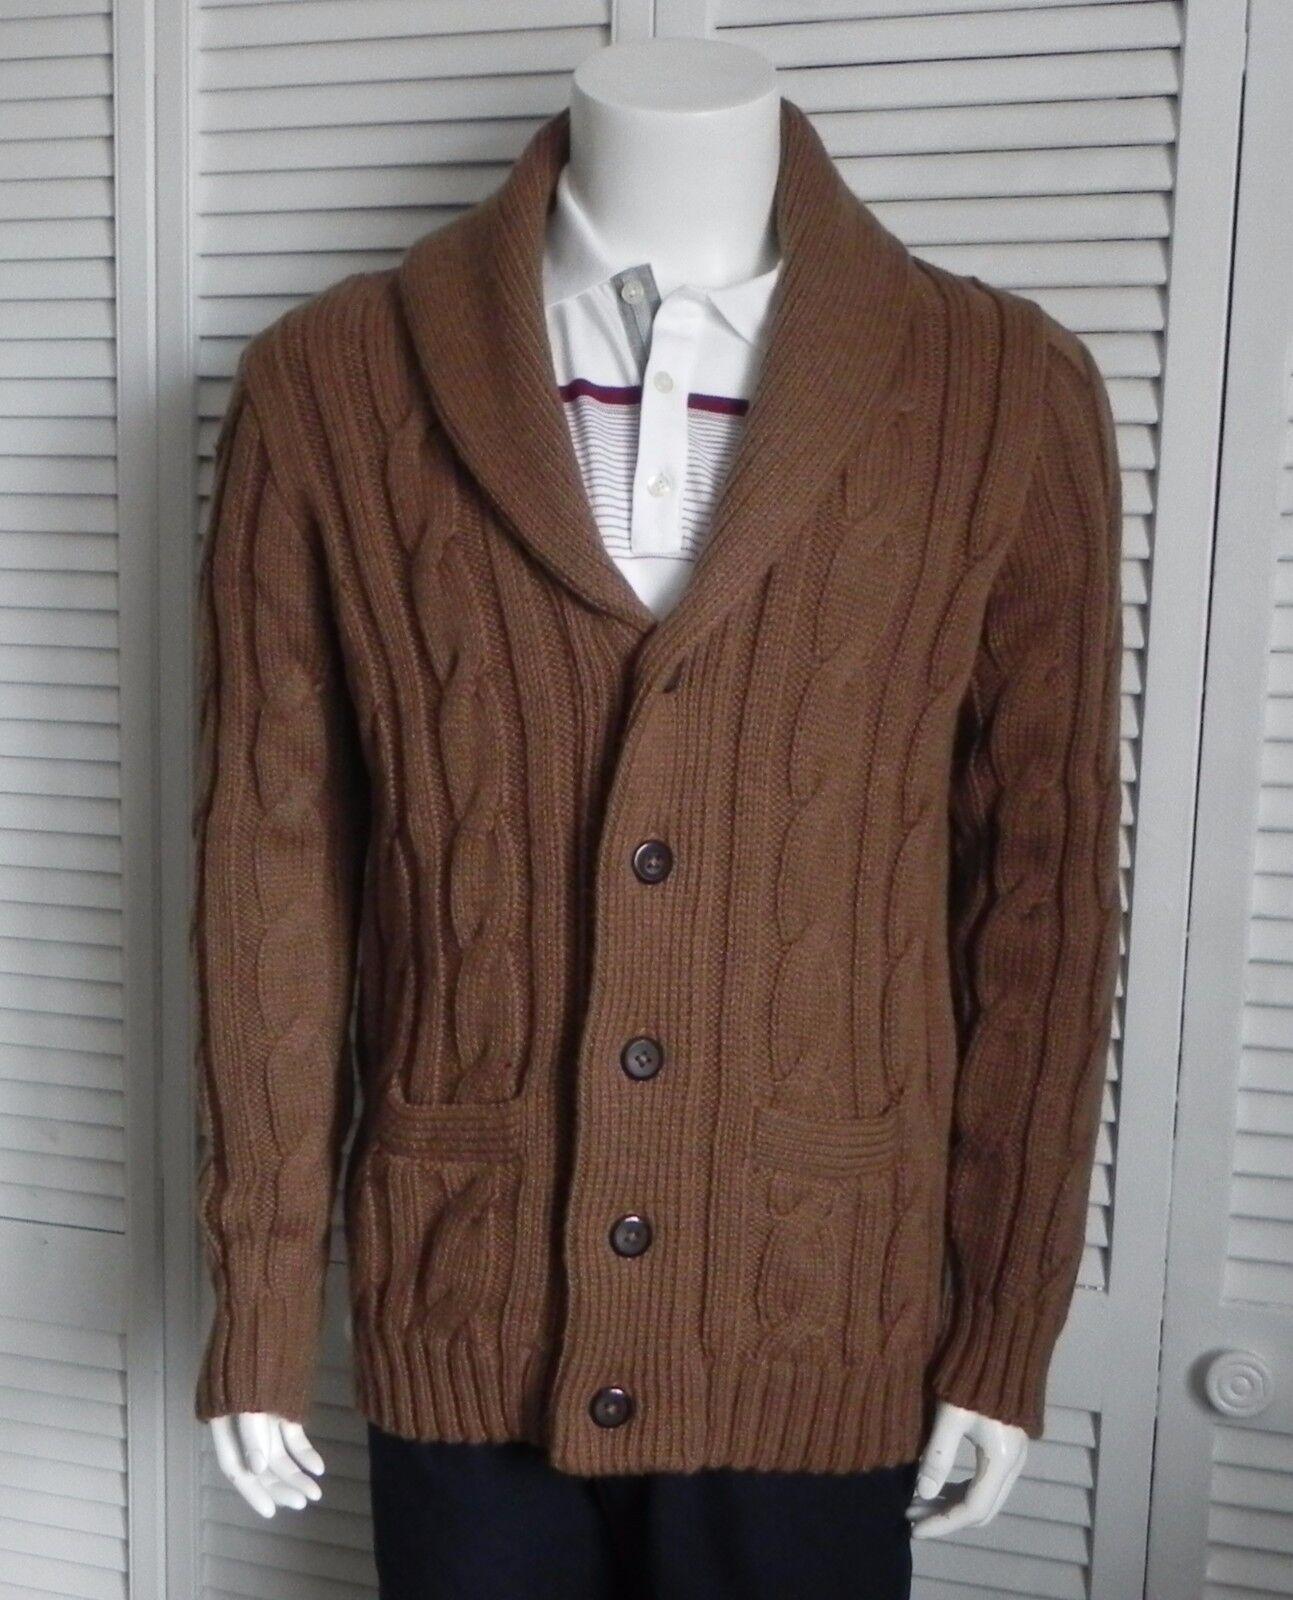 NEW  Herren SIZE M ALPACA Camel Braun Cable Knit Shawl Collar Cardigan Sweater PERU